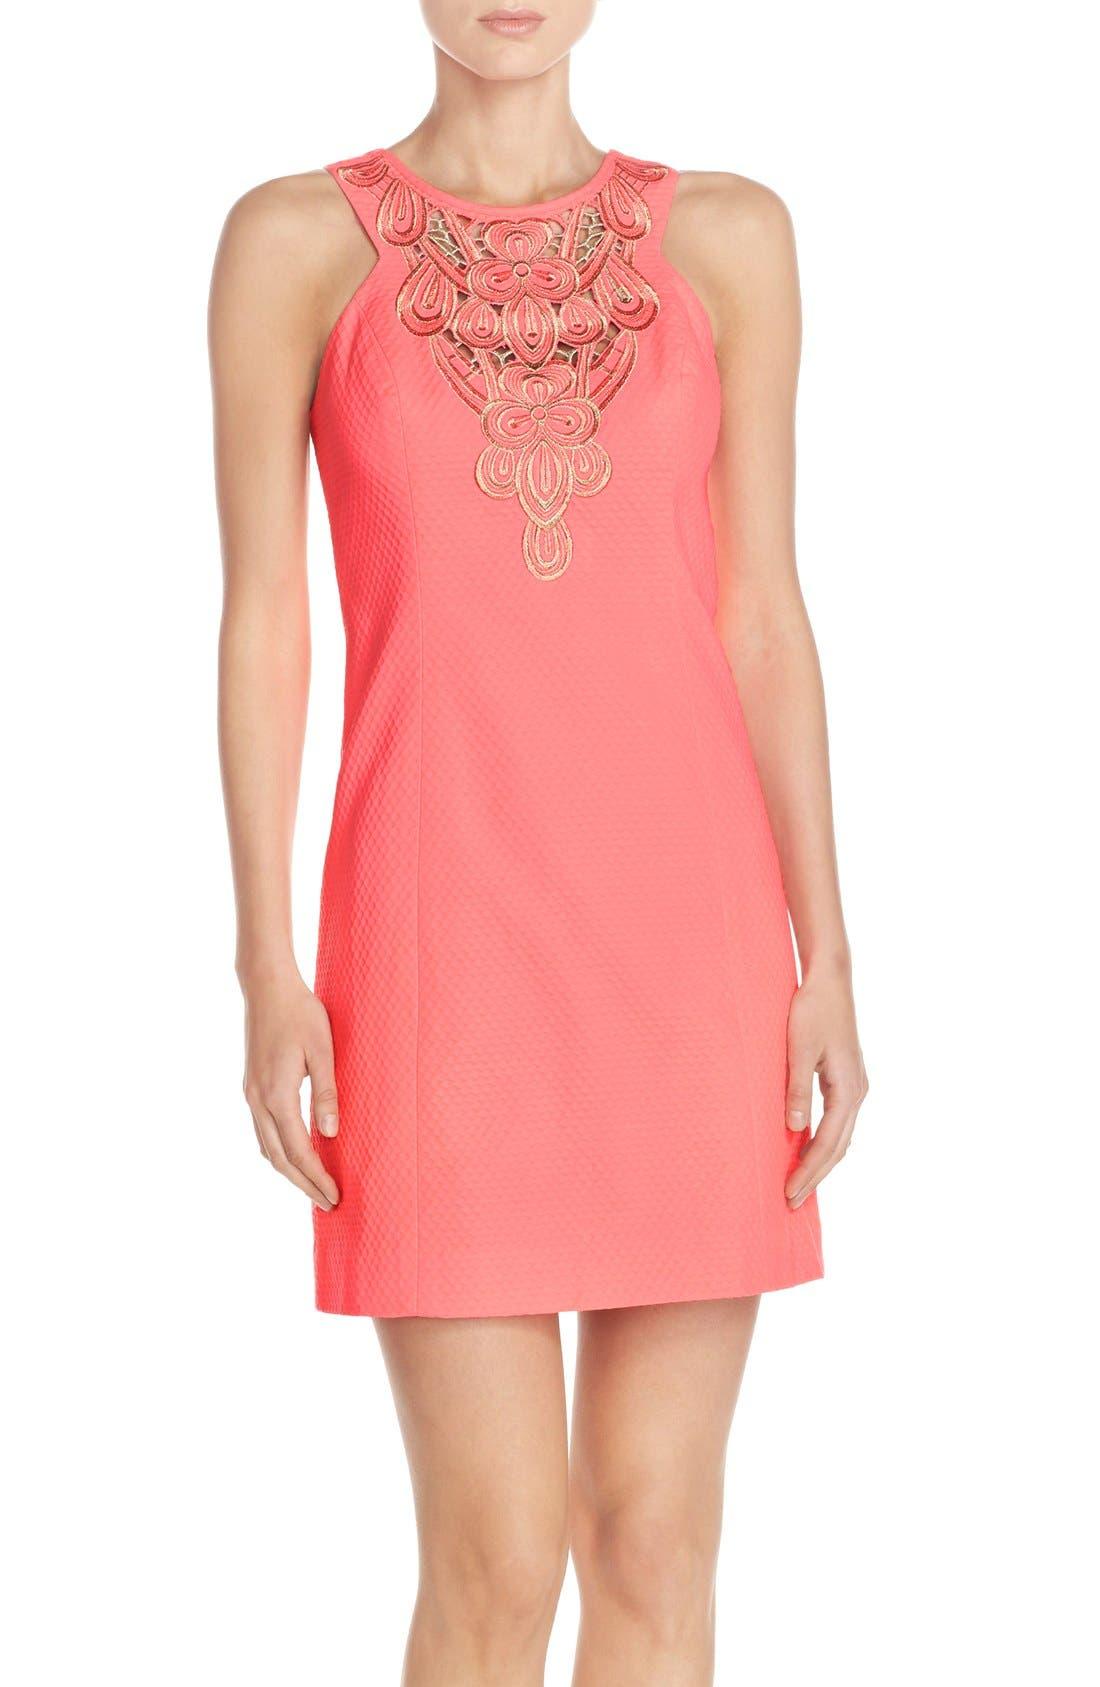 Alternate Image 1 Selected - Lilly Pulitzer® 'Largo' Cotton Piqué Sheath Dress